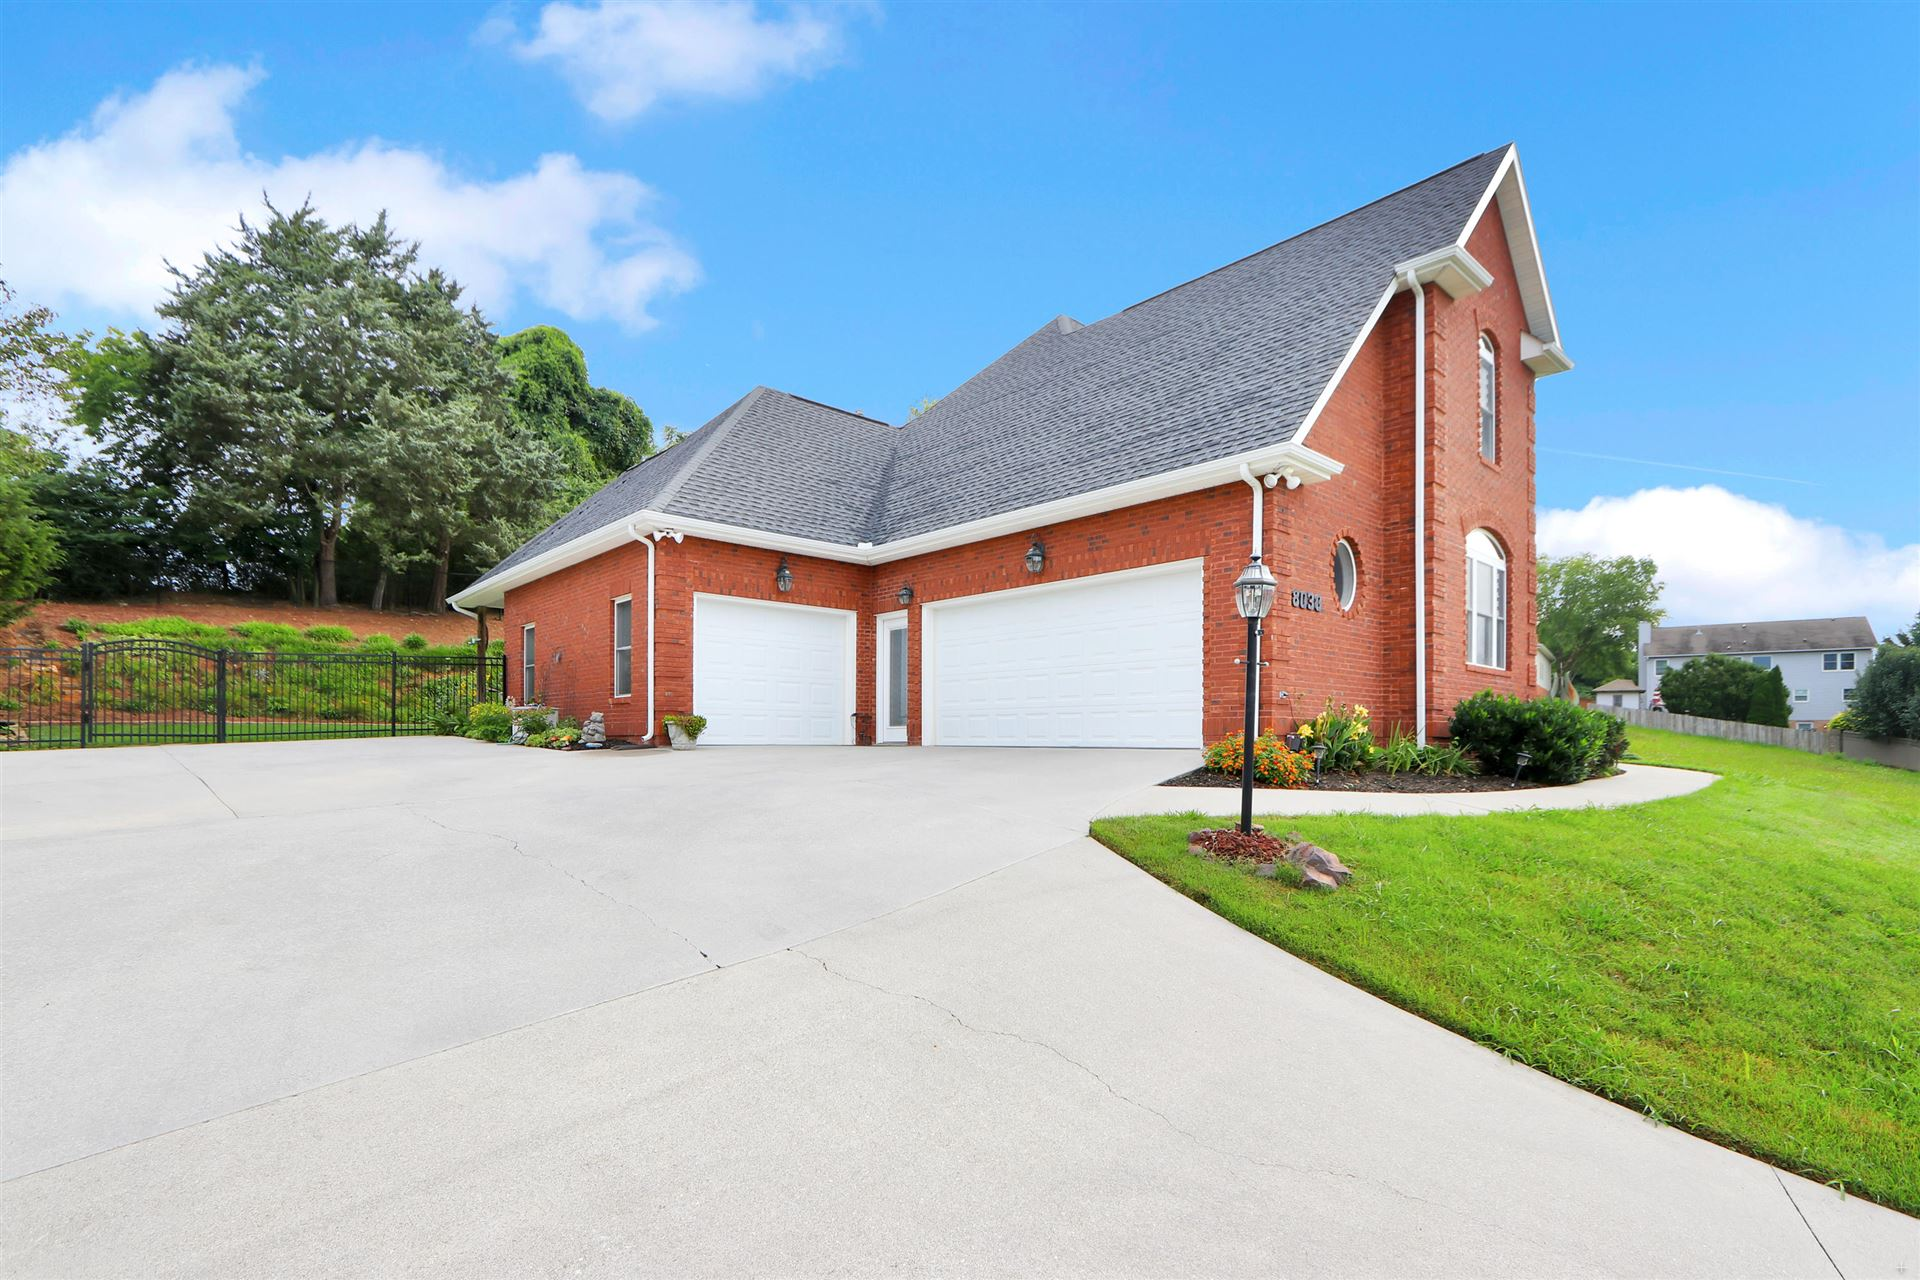 Photo of 8030 Canter Lane, Powell, TN 37849 (MLS # 1160325)